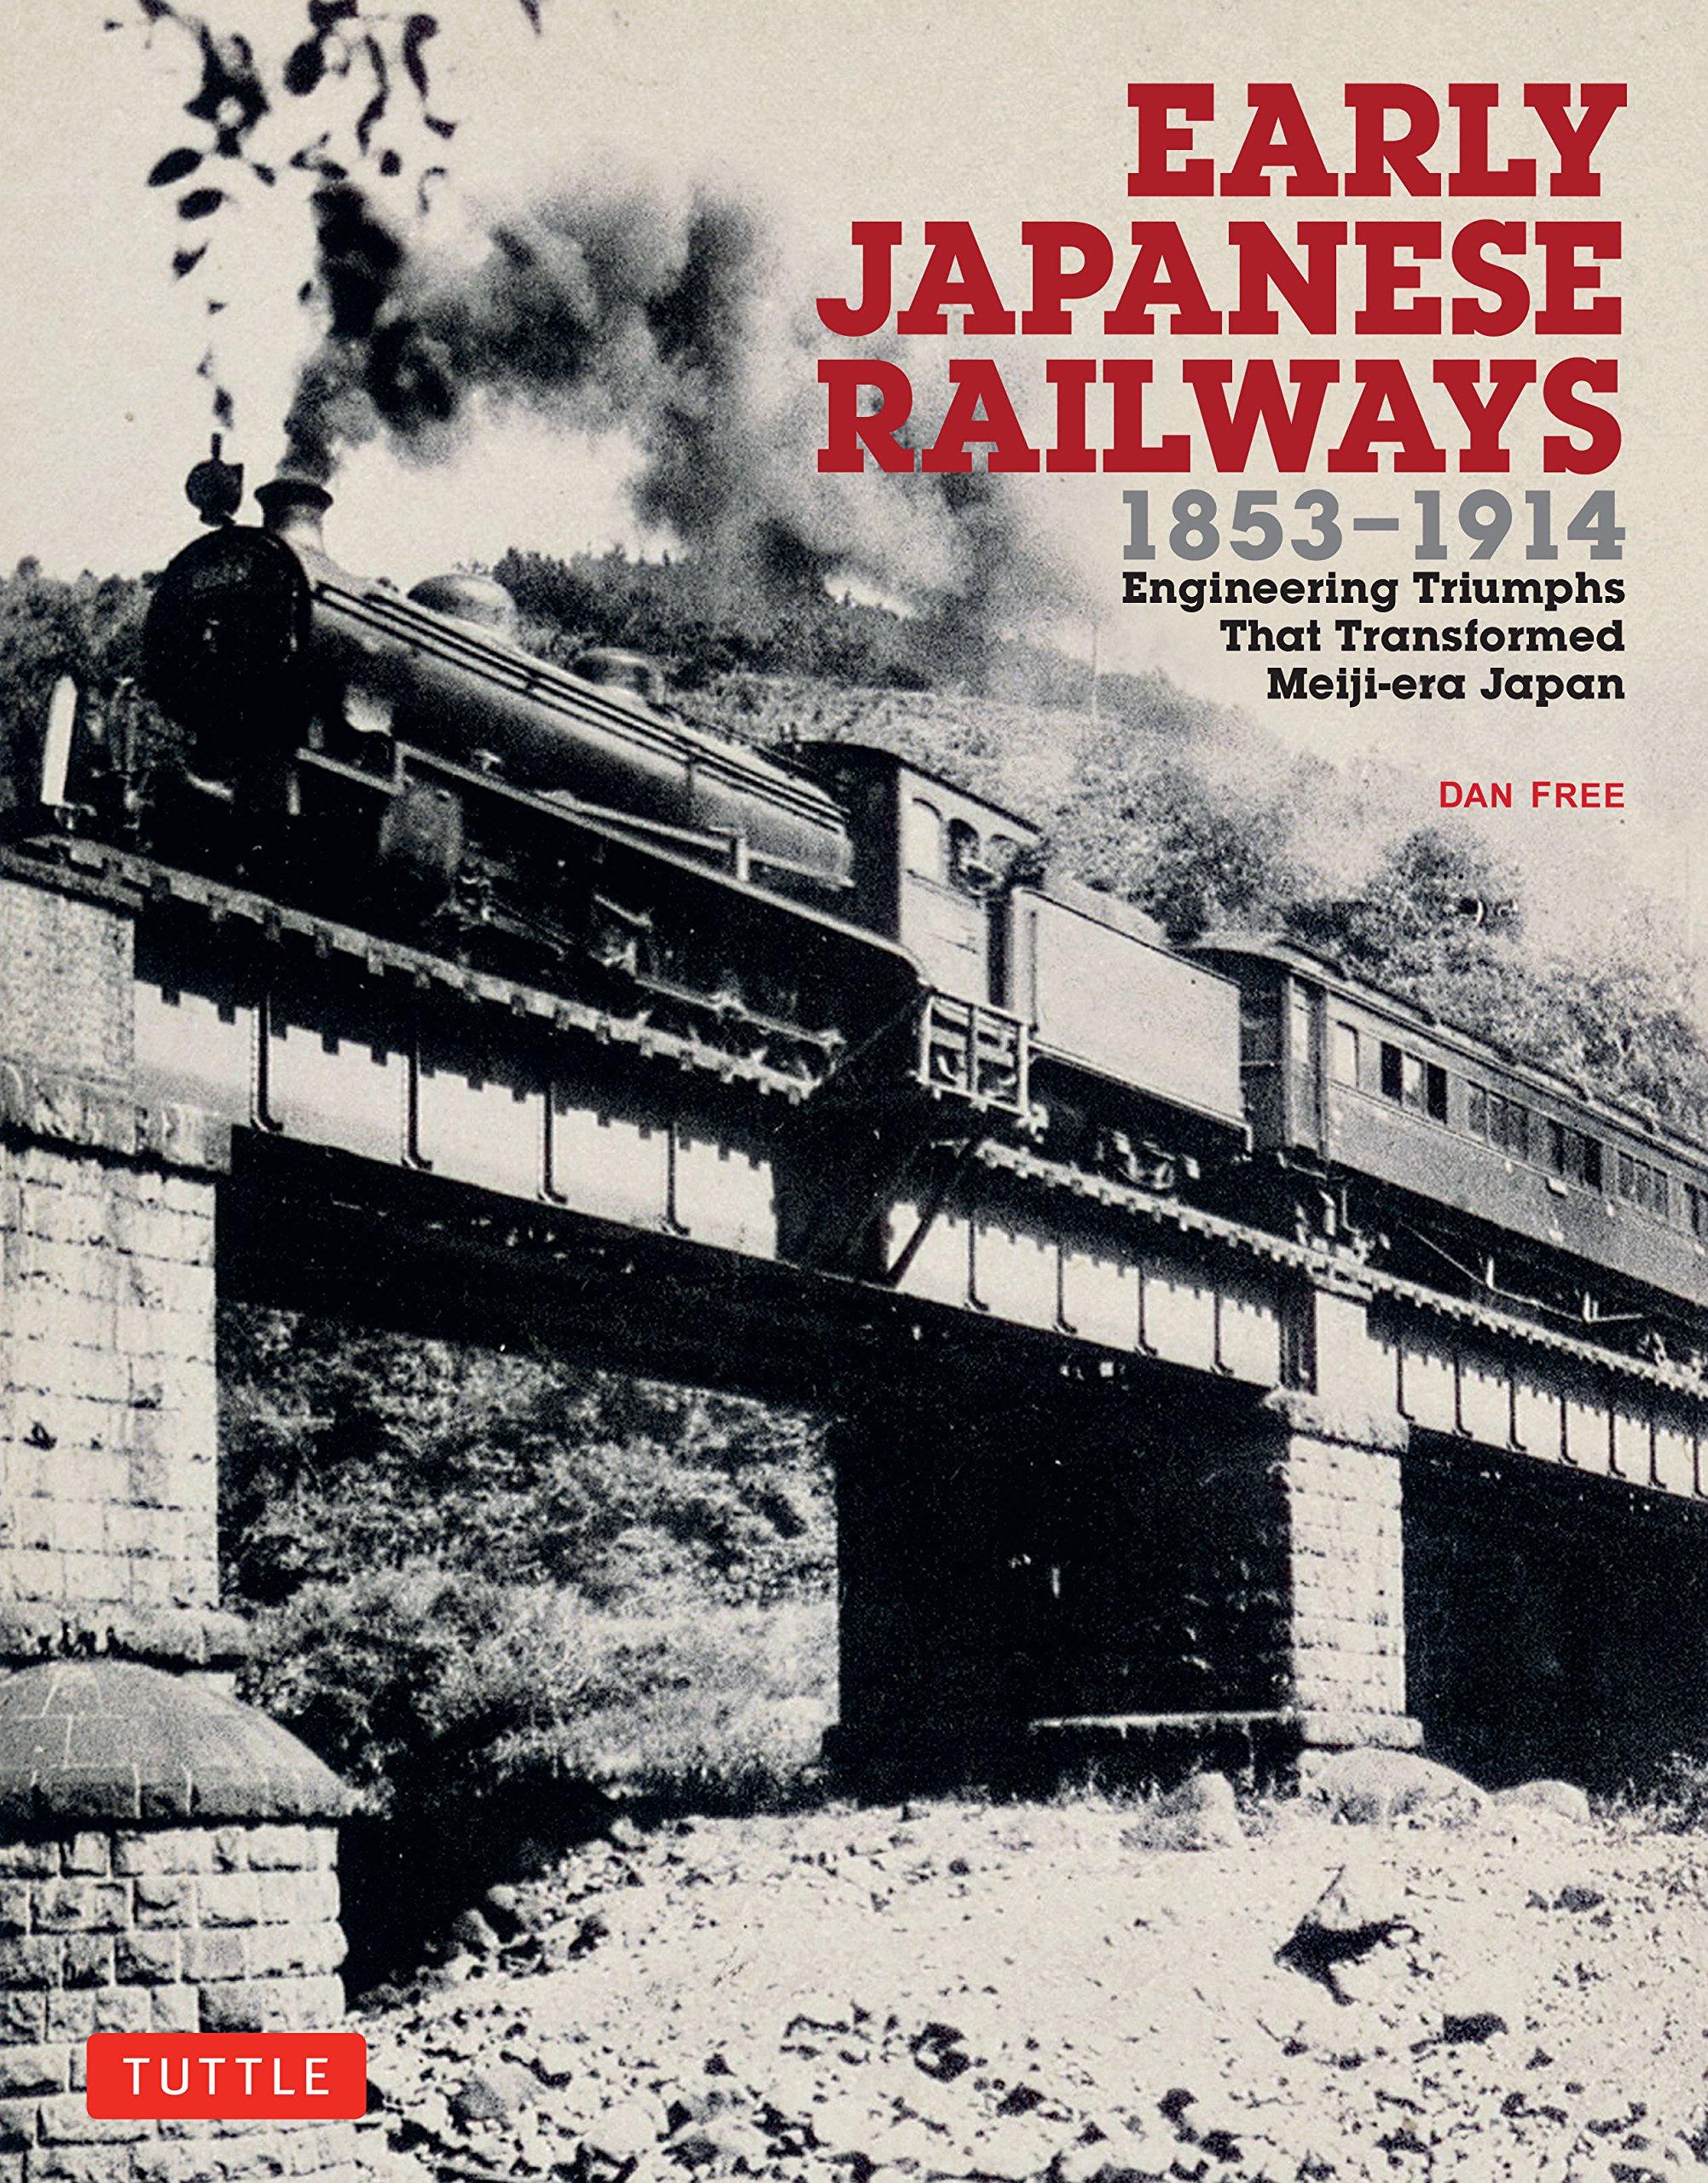 Read Online Early Japanese Railways 1853-1914: Engineering Triumphs That Transformed Meiji-era Japan PDF